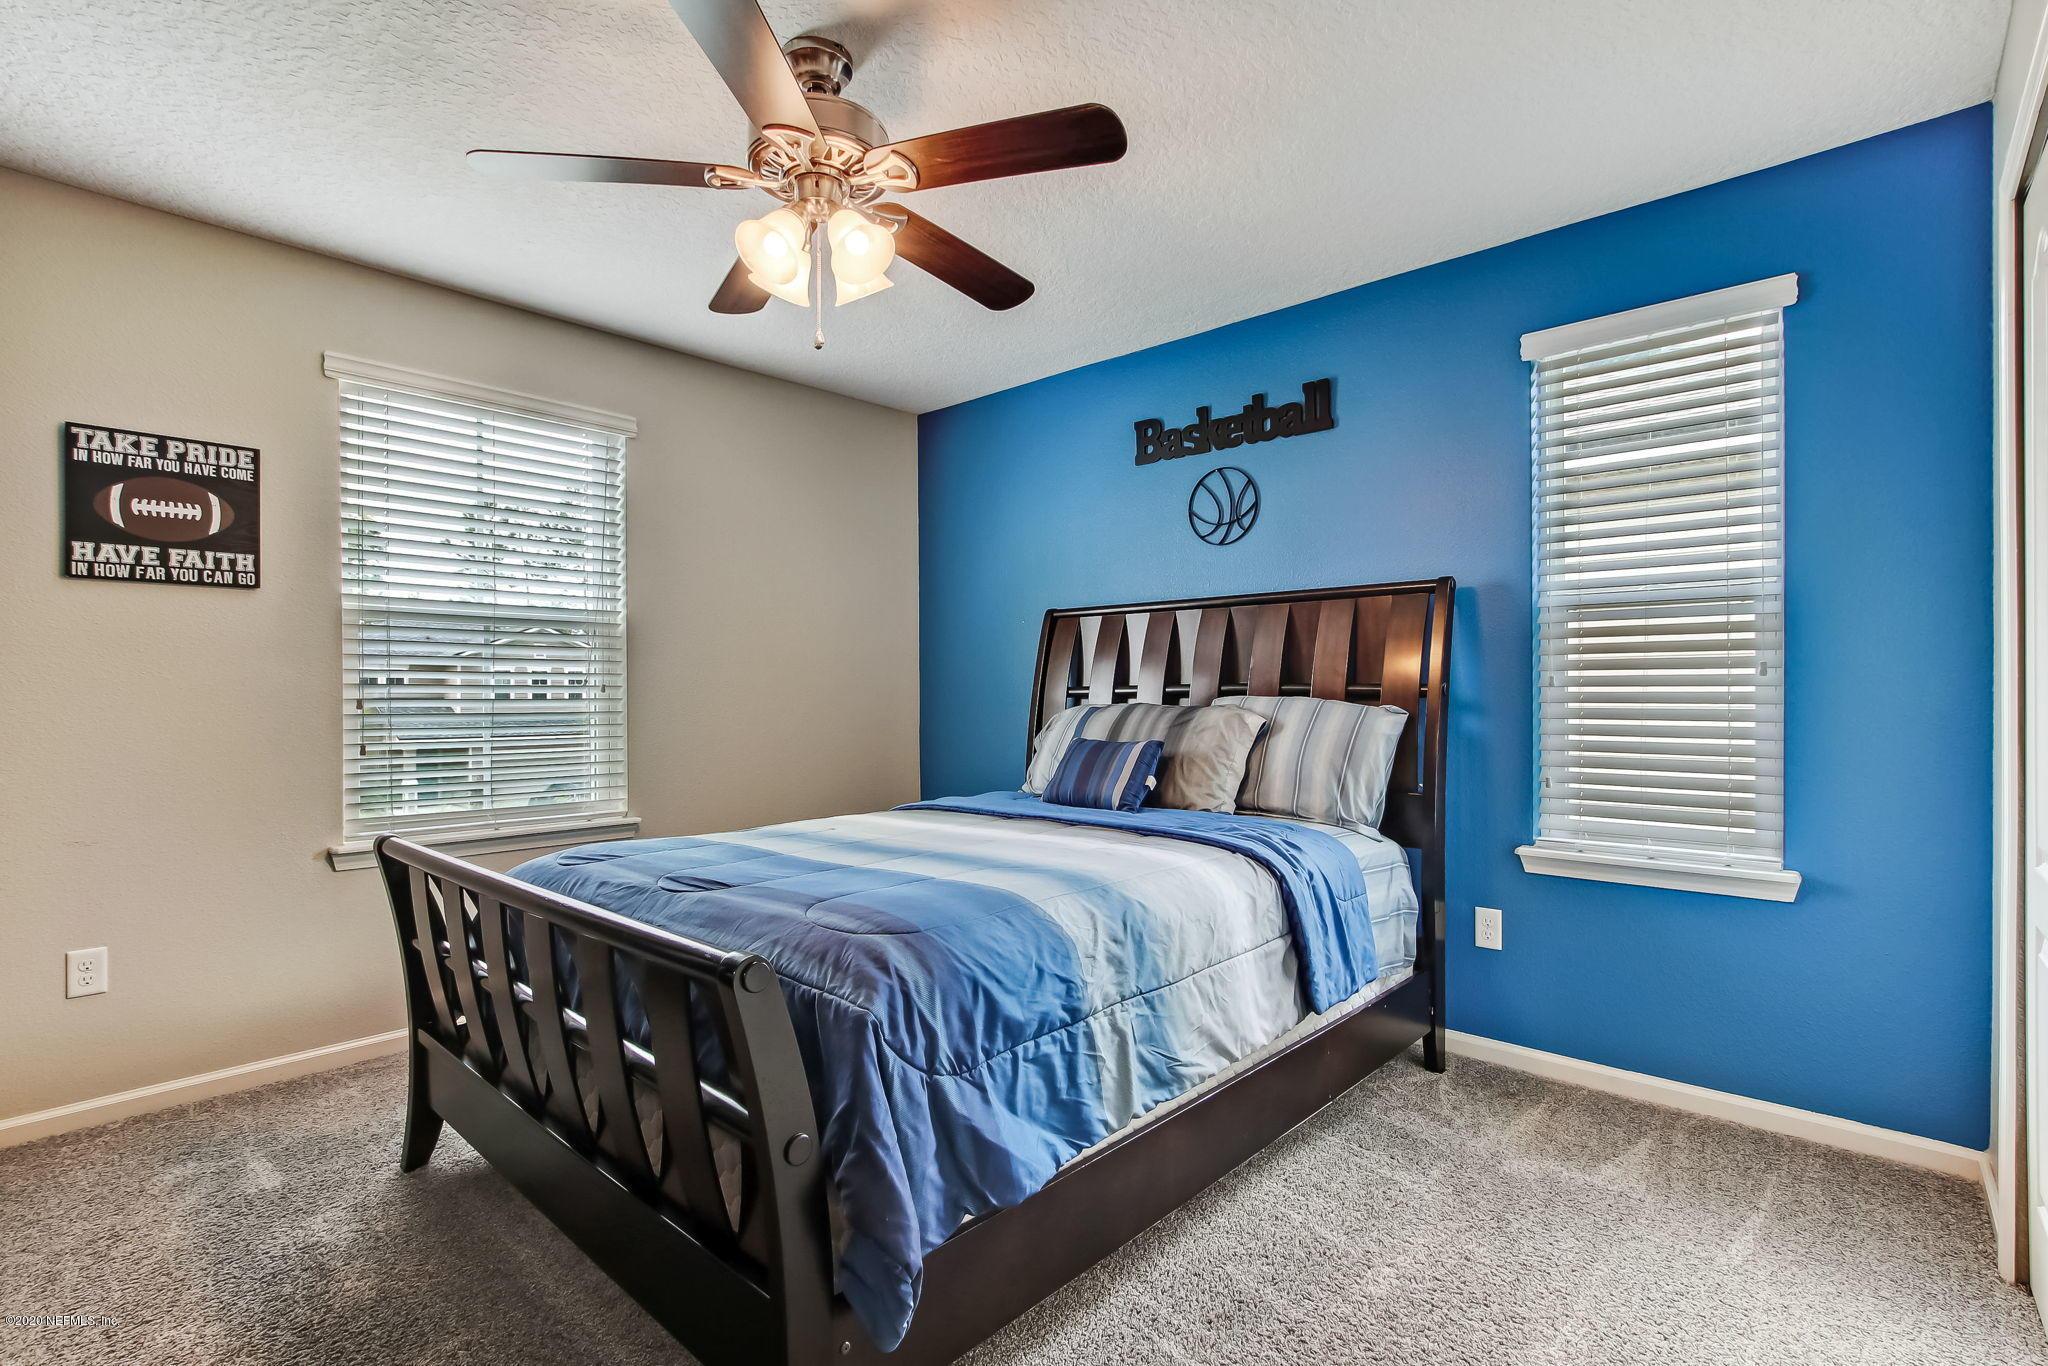 6679 AZALEA PARK, JACKSONVILLE, FLORIDA 32259, 4 Bedrooms Bedrooms, ,2 BathroomsBathrooms,Residential,For sale,AZALEA PARK,1081678